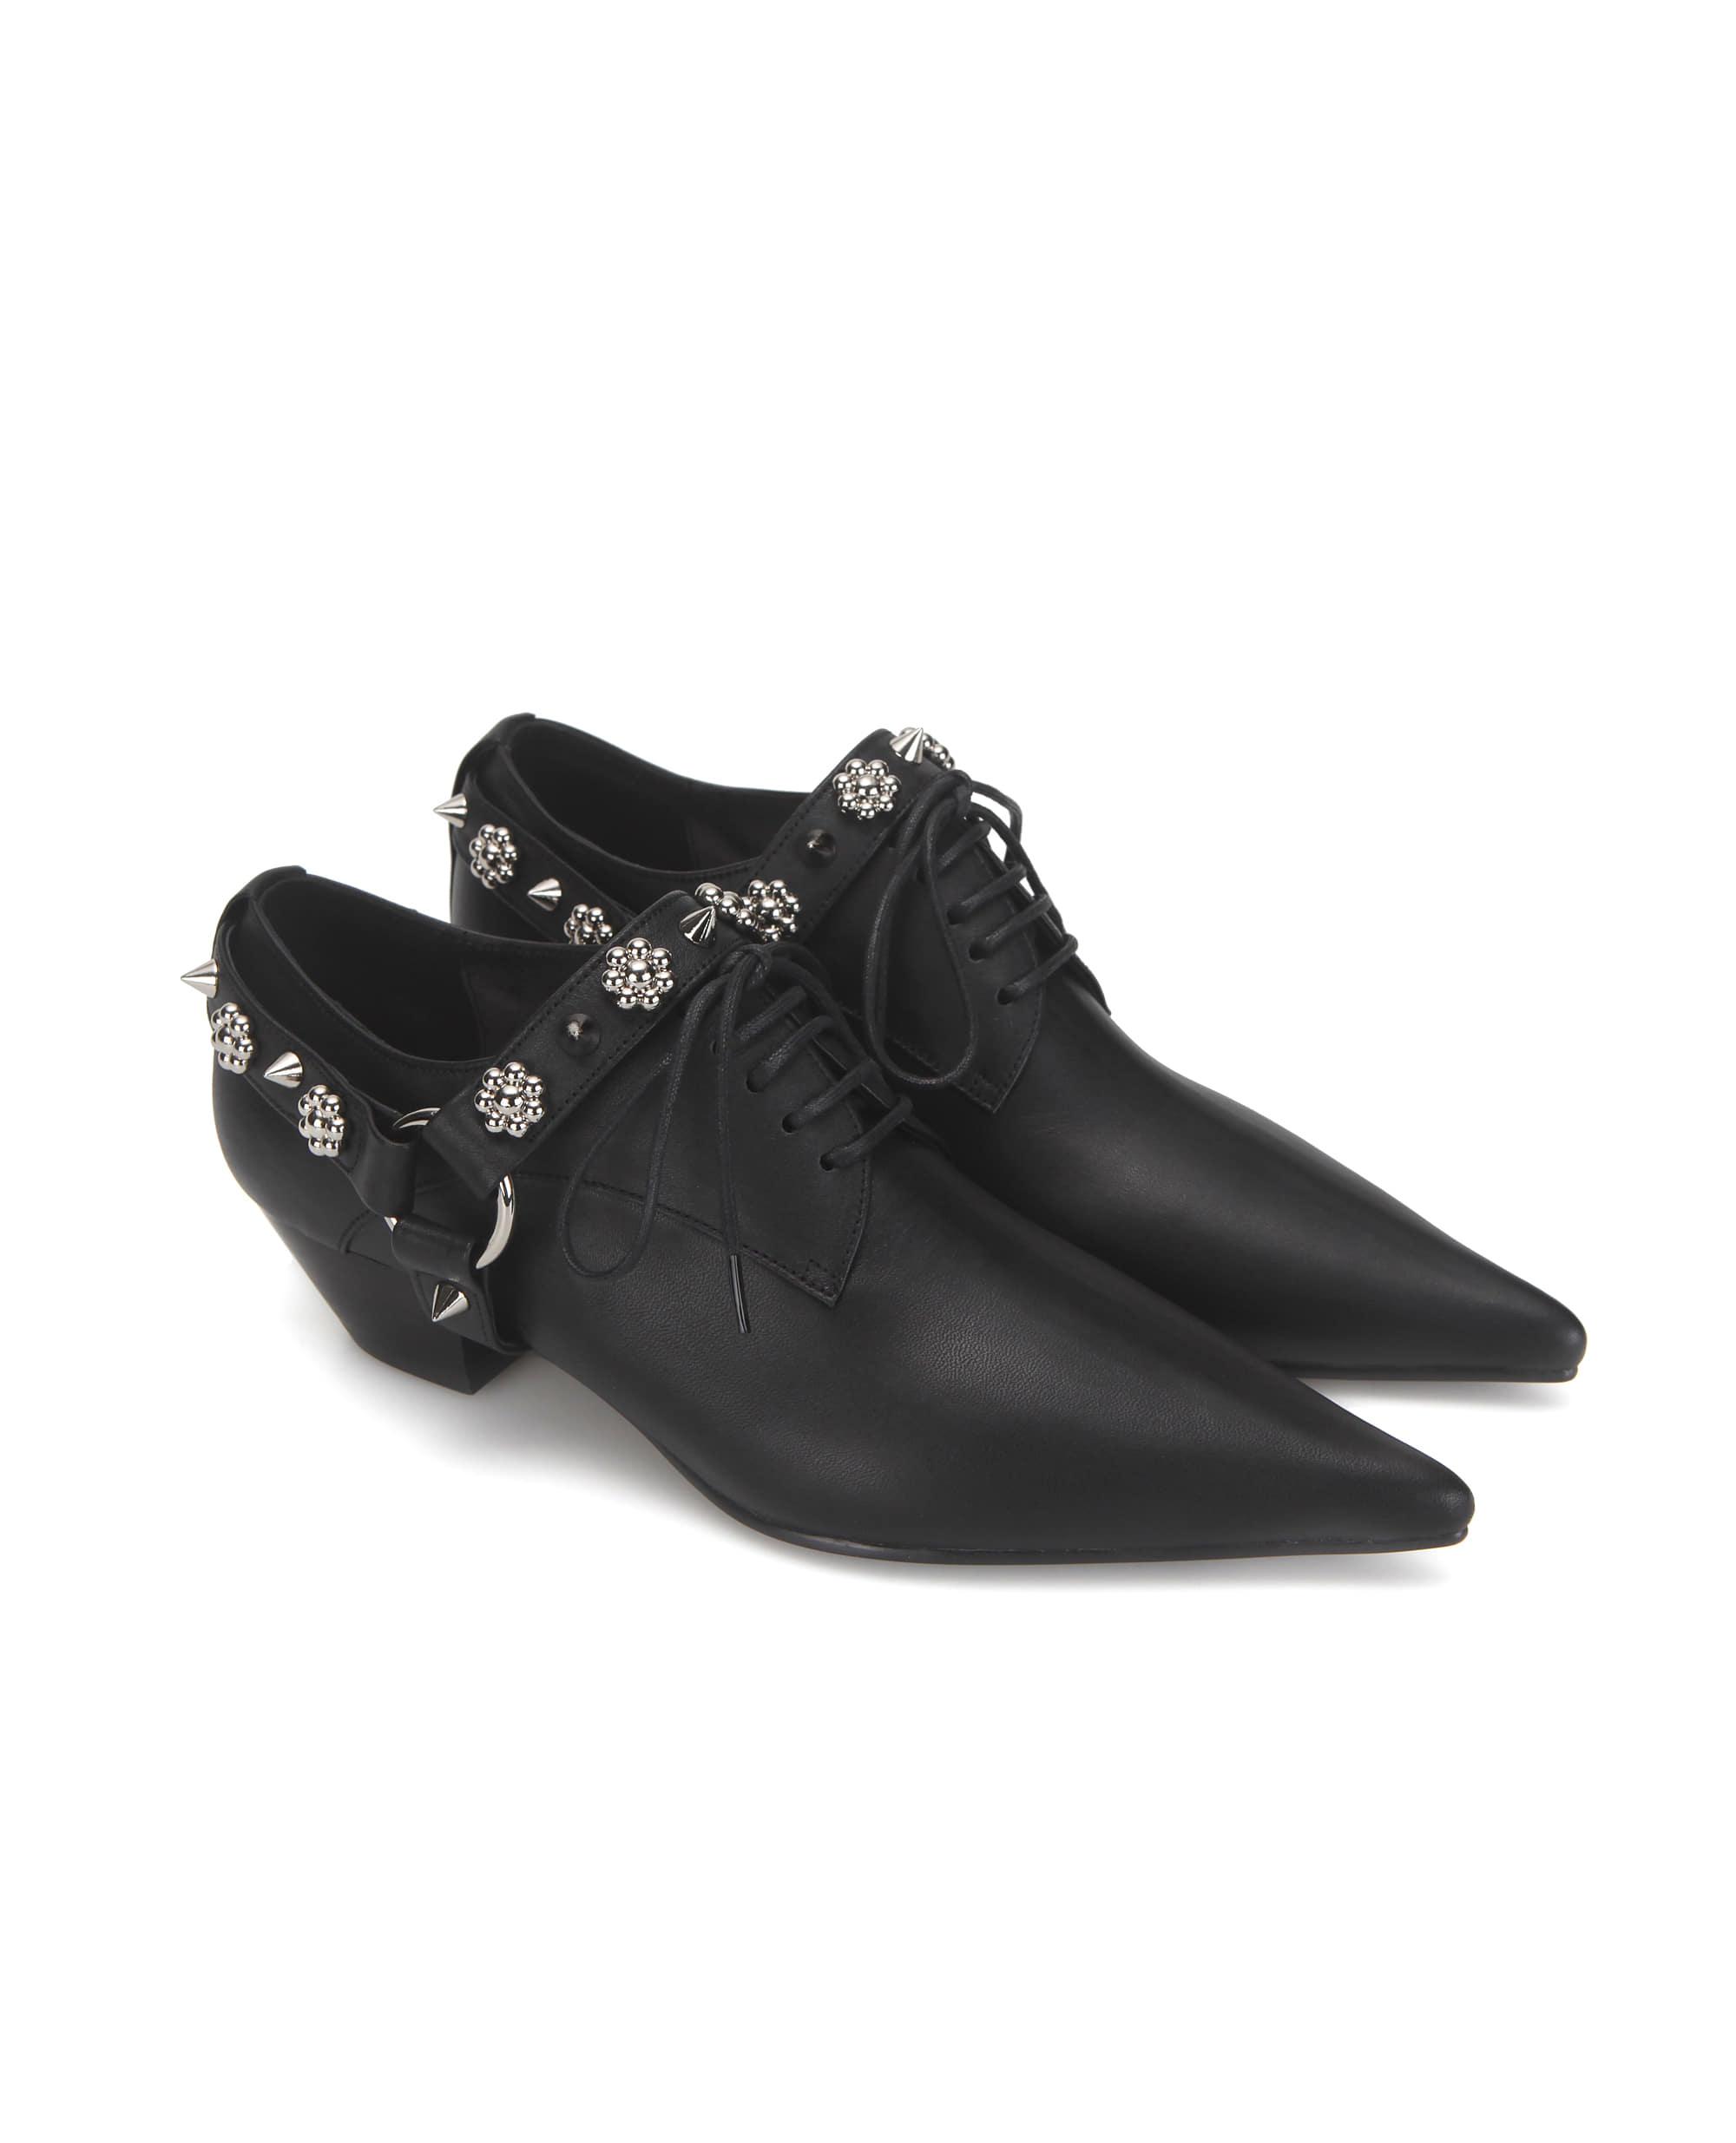 Extreme sharp toe flower derbys | Black